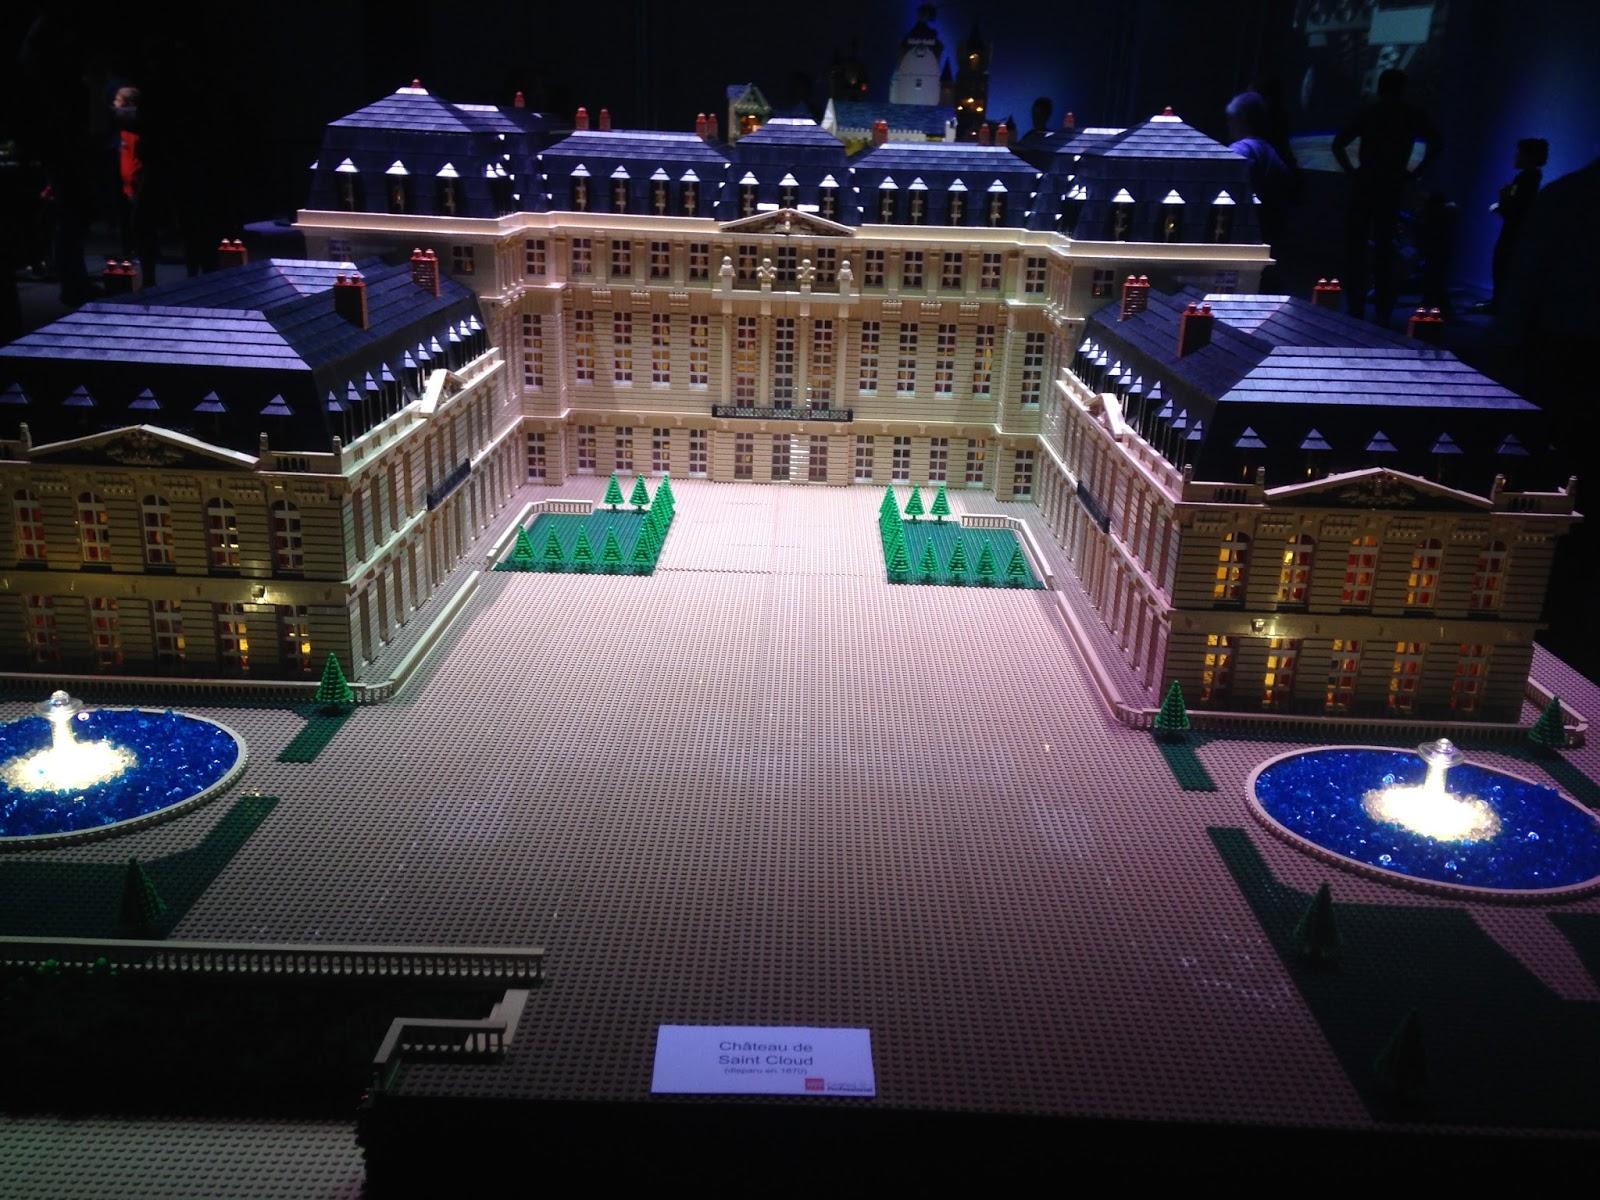 Lego, château de Saint-Cloud